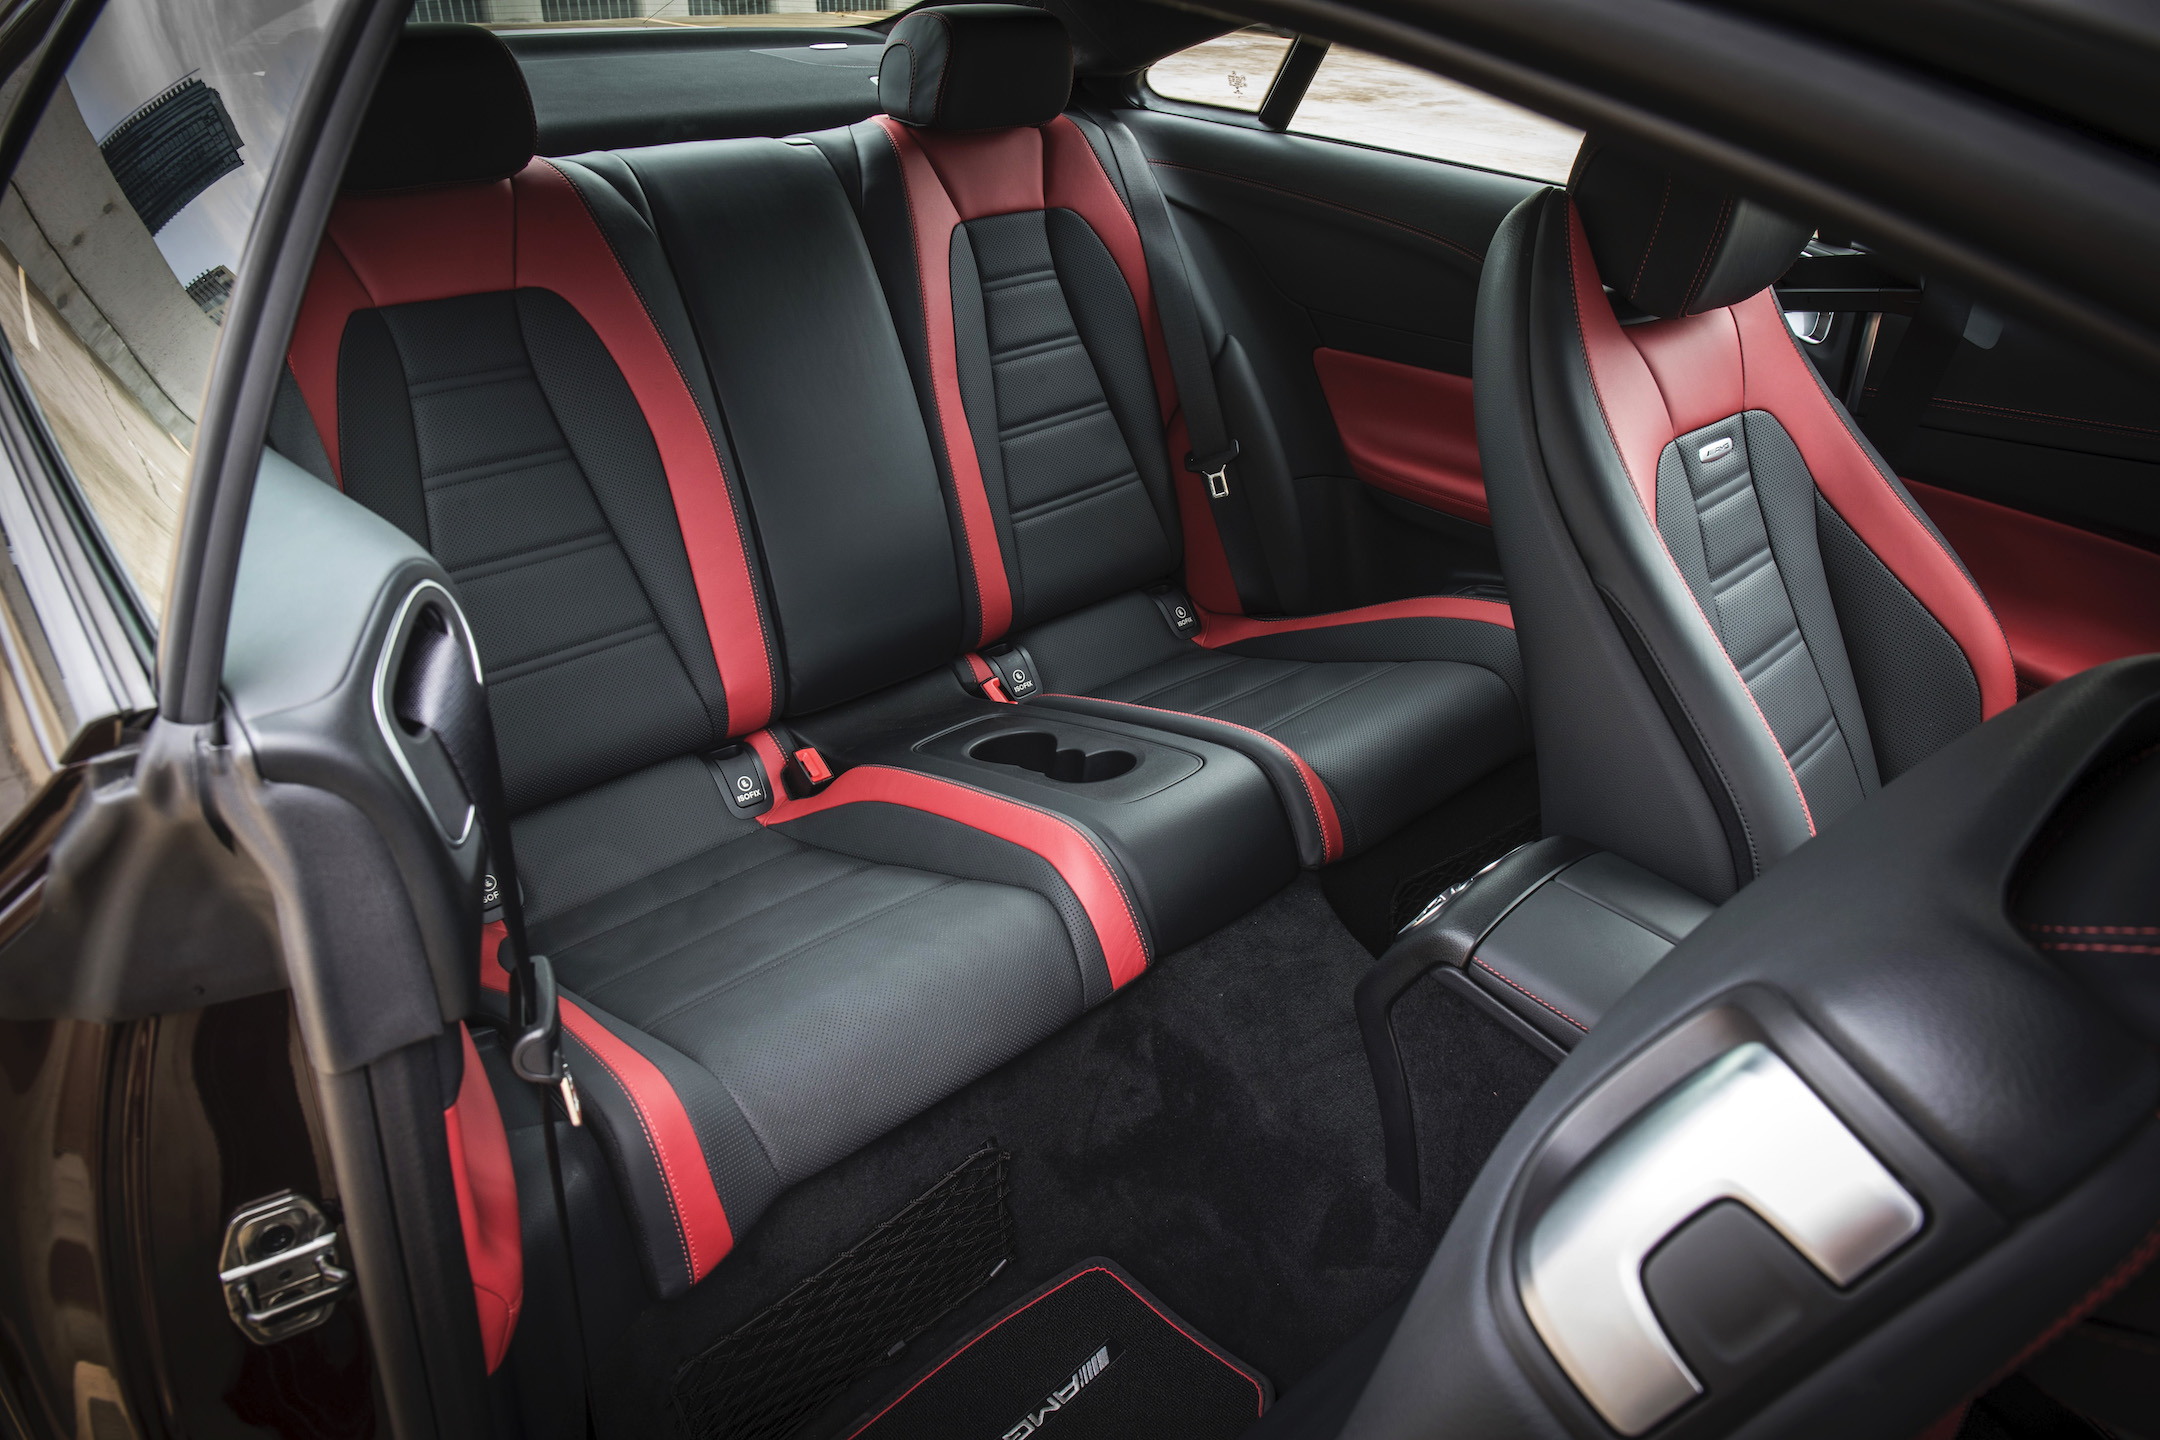 Mercedes-AMG E 53 4MATIC+ Coupe, rubellite red. Austin 2018